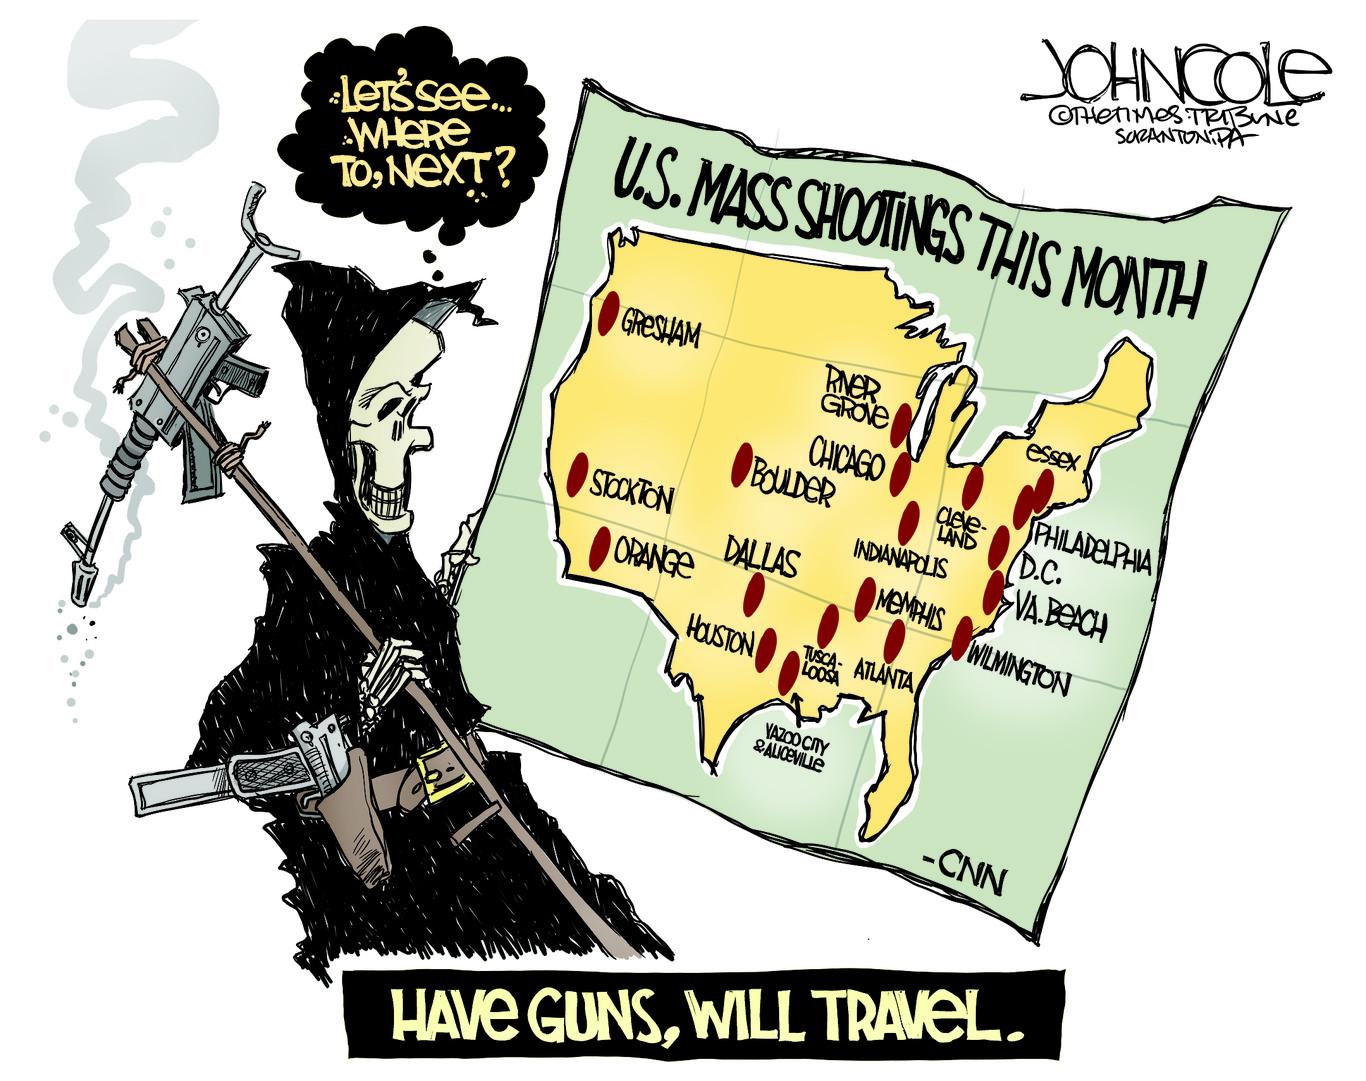 MASS SHOOTINGS, BOULDER, TUSCALOOSA, ATLANTA, INDIANAPOLIS, NRA, CONGRESS, SEMI AUTOMATIC WEAPONS, MENTAL HEALTH